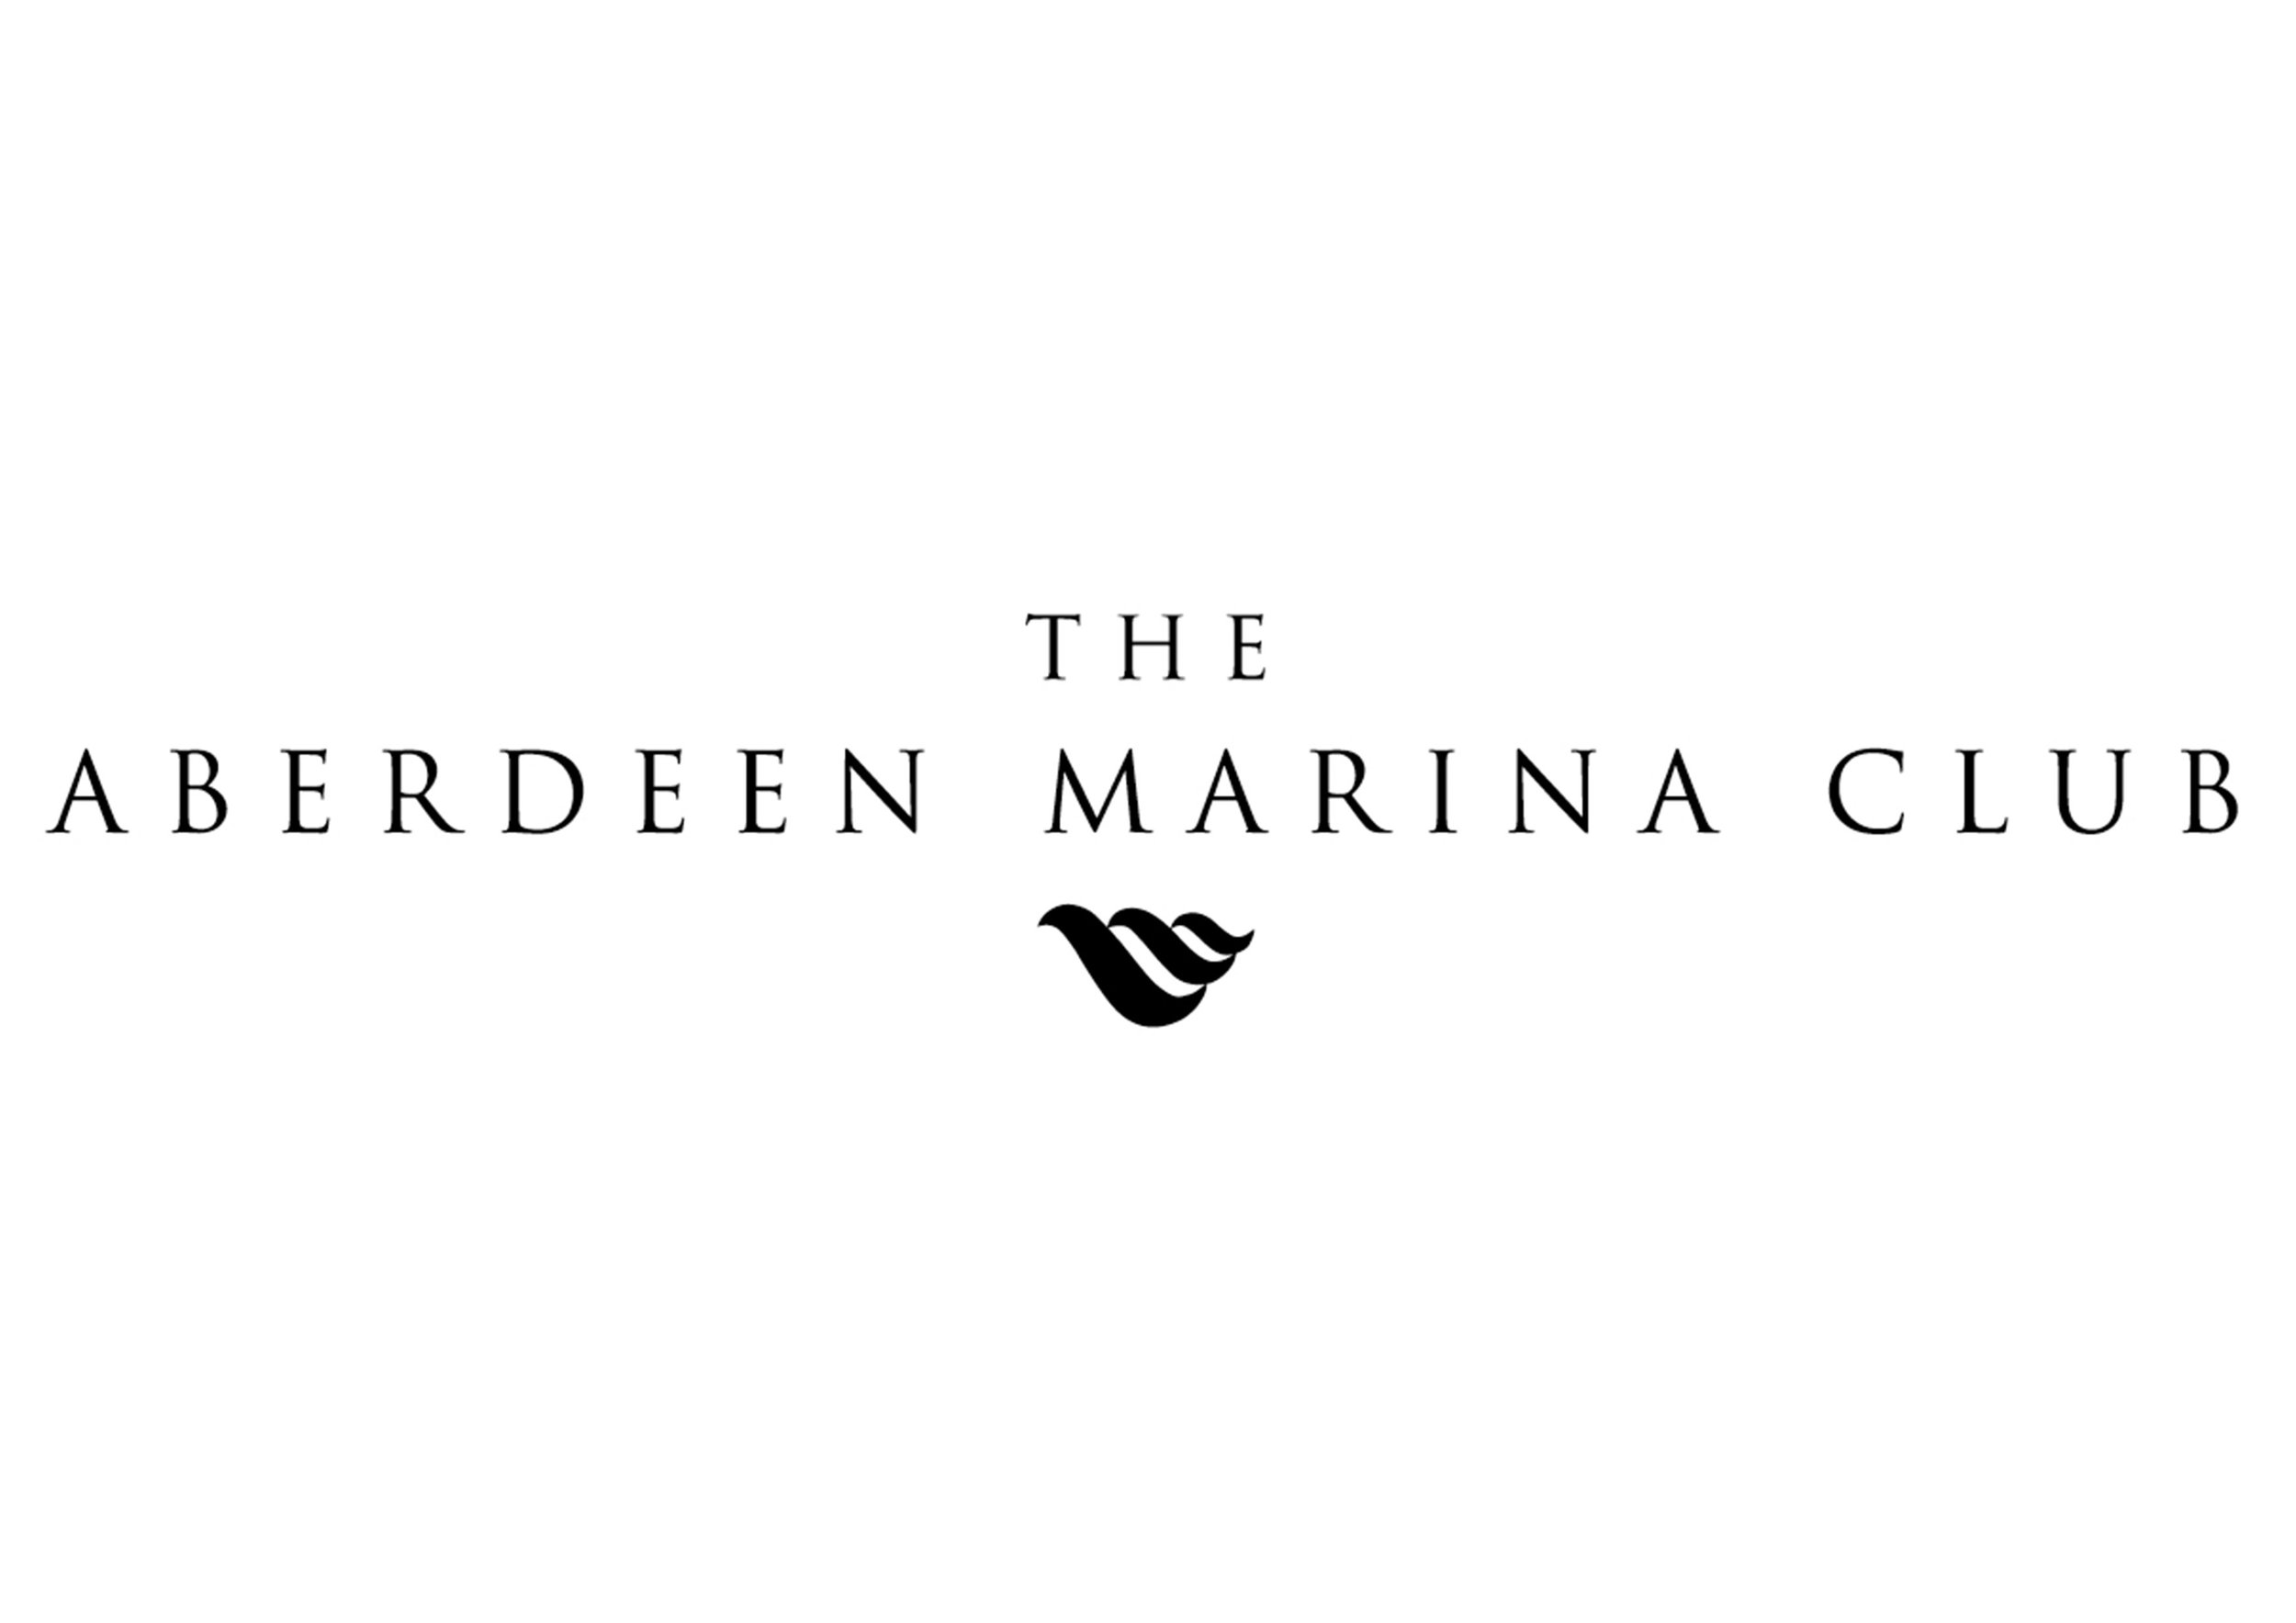 Aberdeen Marina Club.jpg